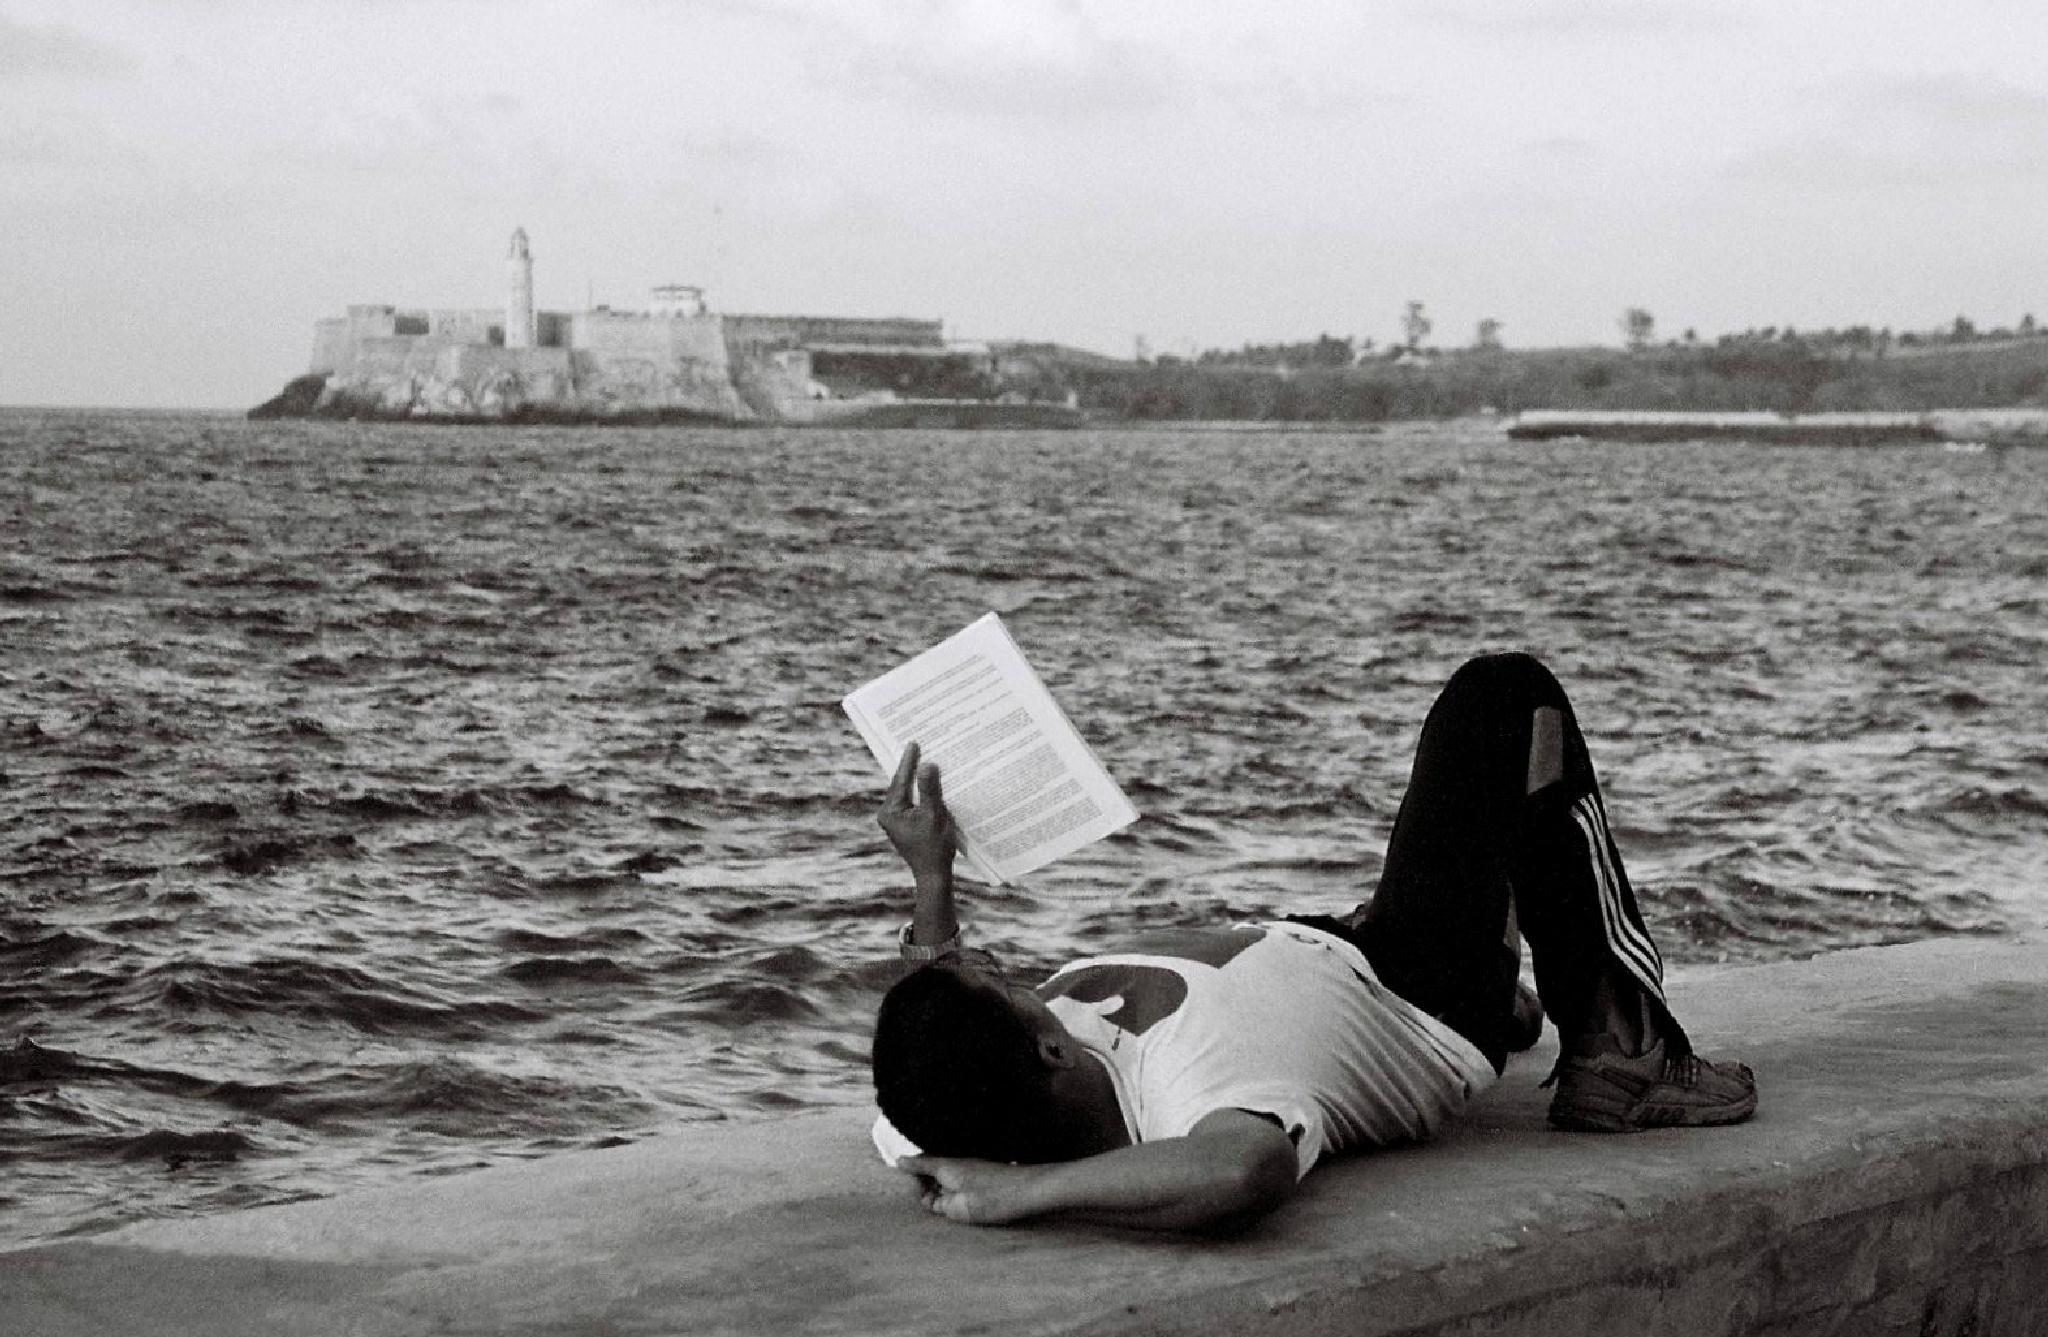 Cliffhanger by Detlef F. Rimkus